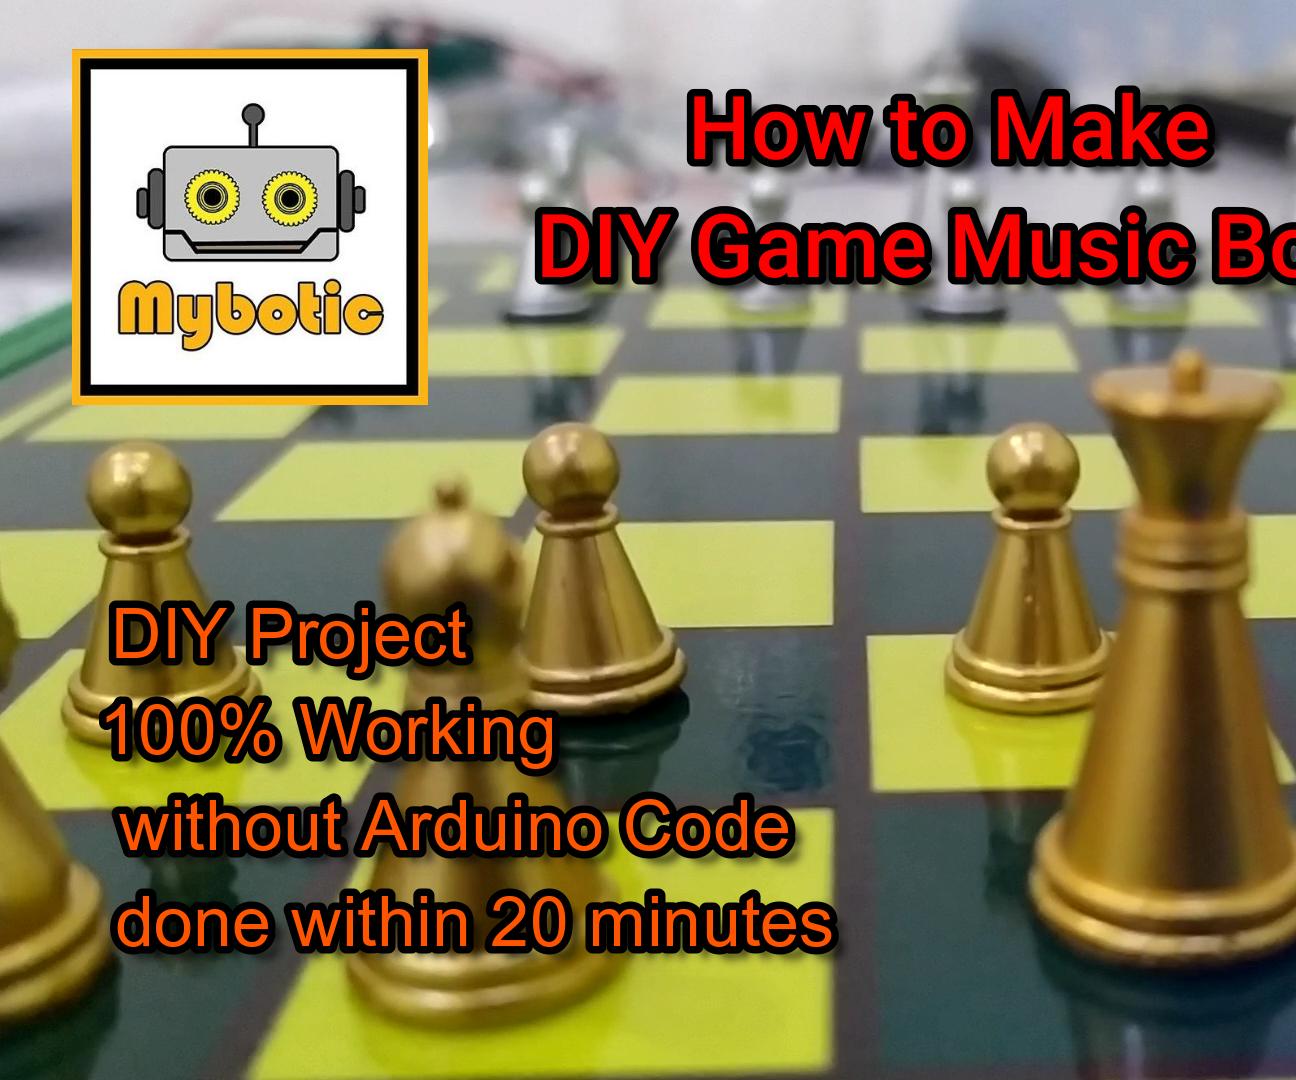 How to Make DIY Game Music Box